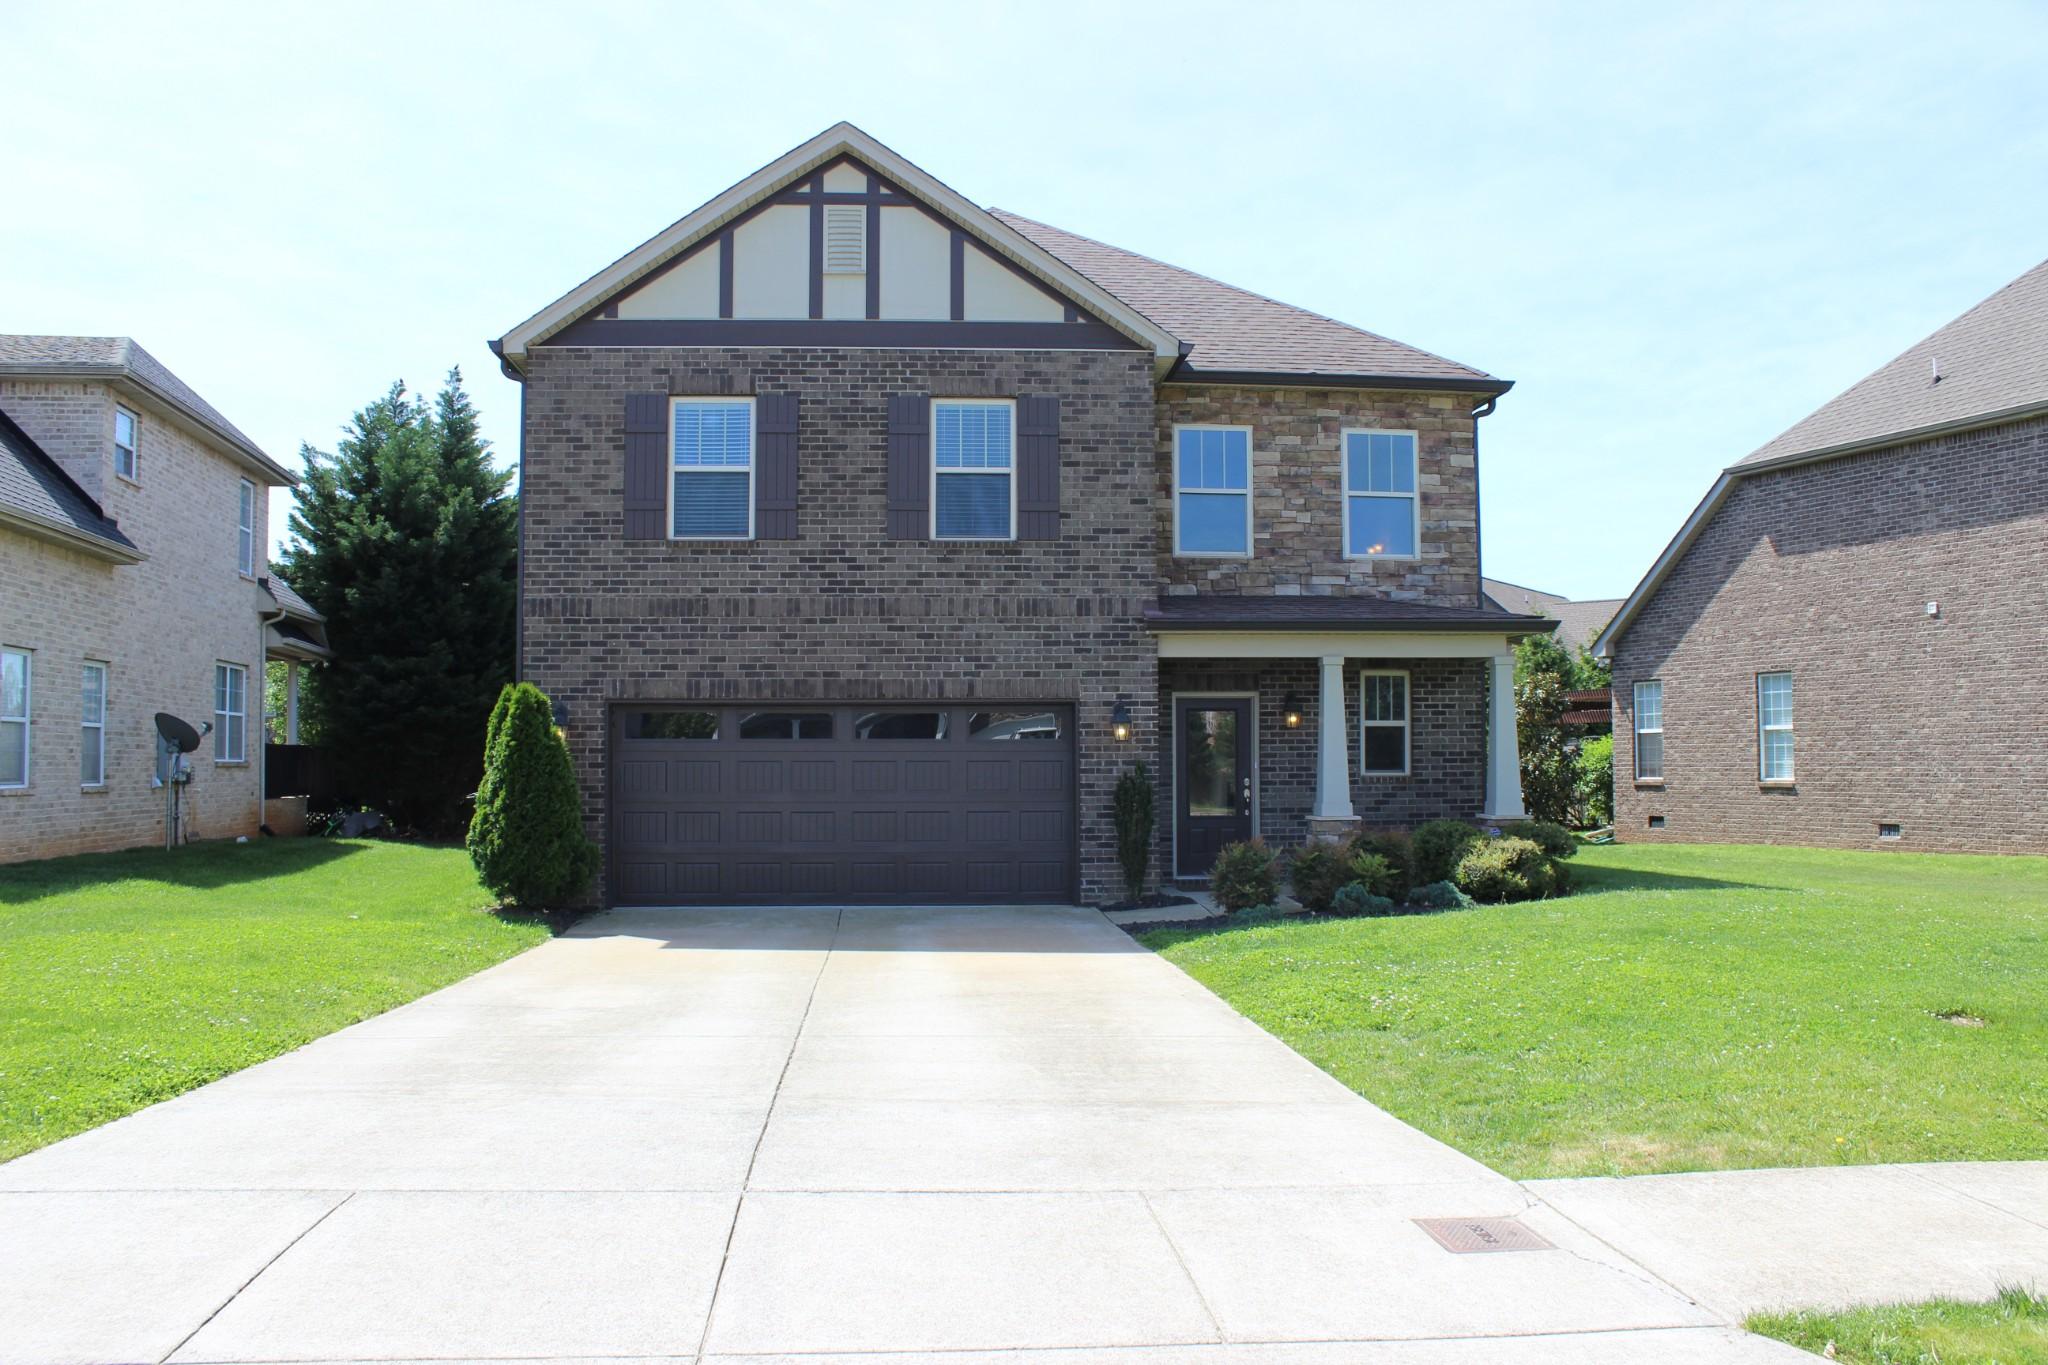 5207 Starnes Dr Property Photo - Murfreesboro, TN real estate listing